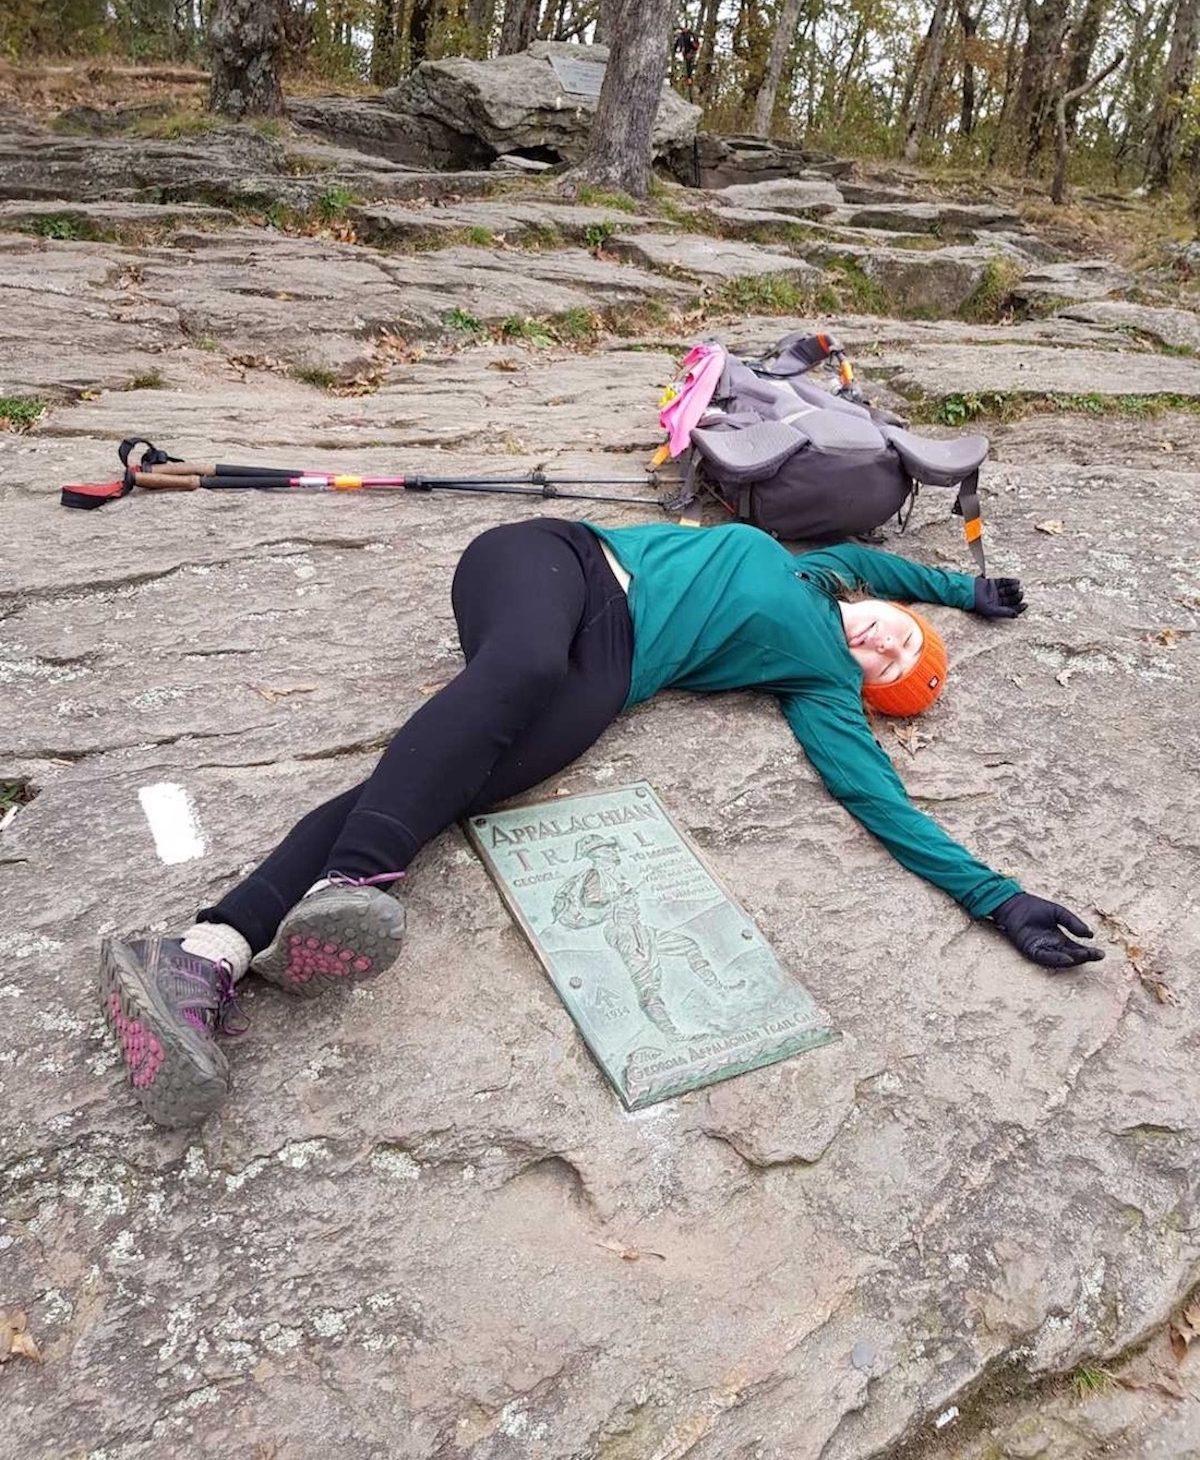 Avoid These 8 Common Thru-Hiking Mistakes - The Trek